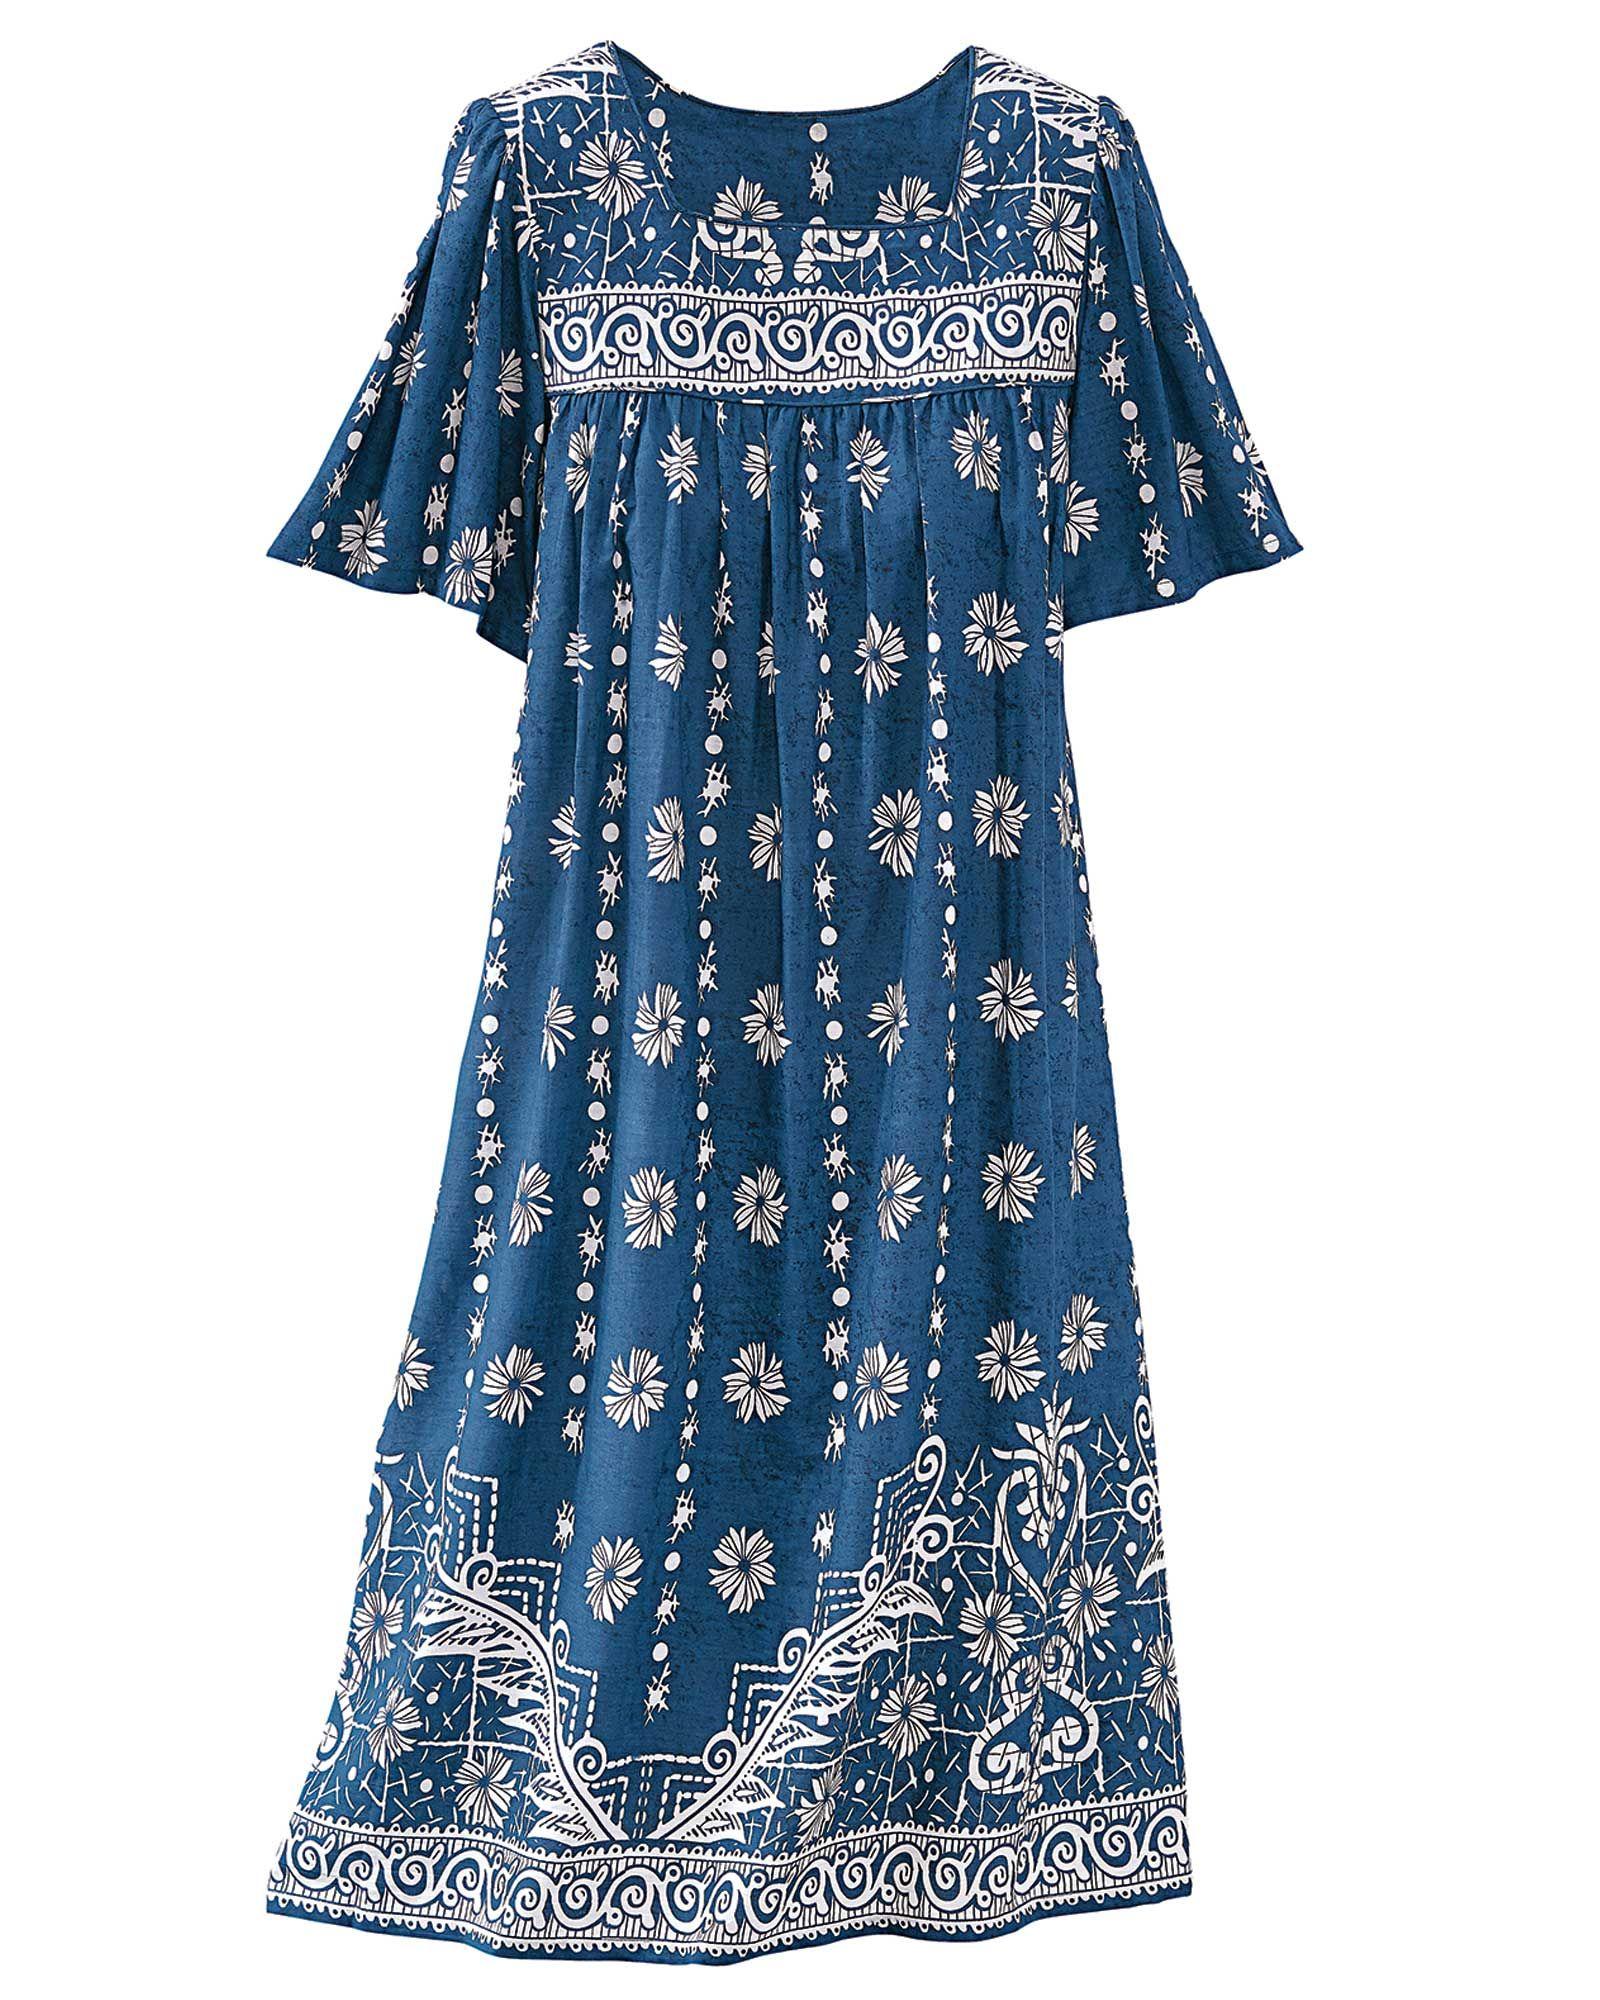 Polyester Slip-on Dress In 2020